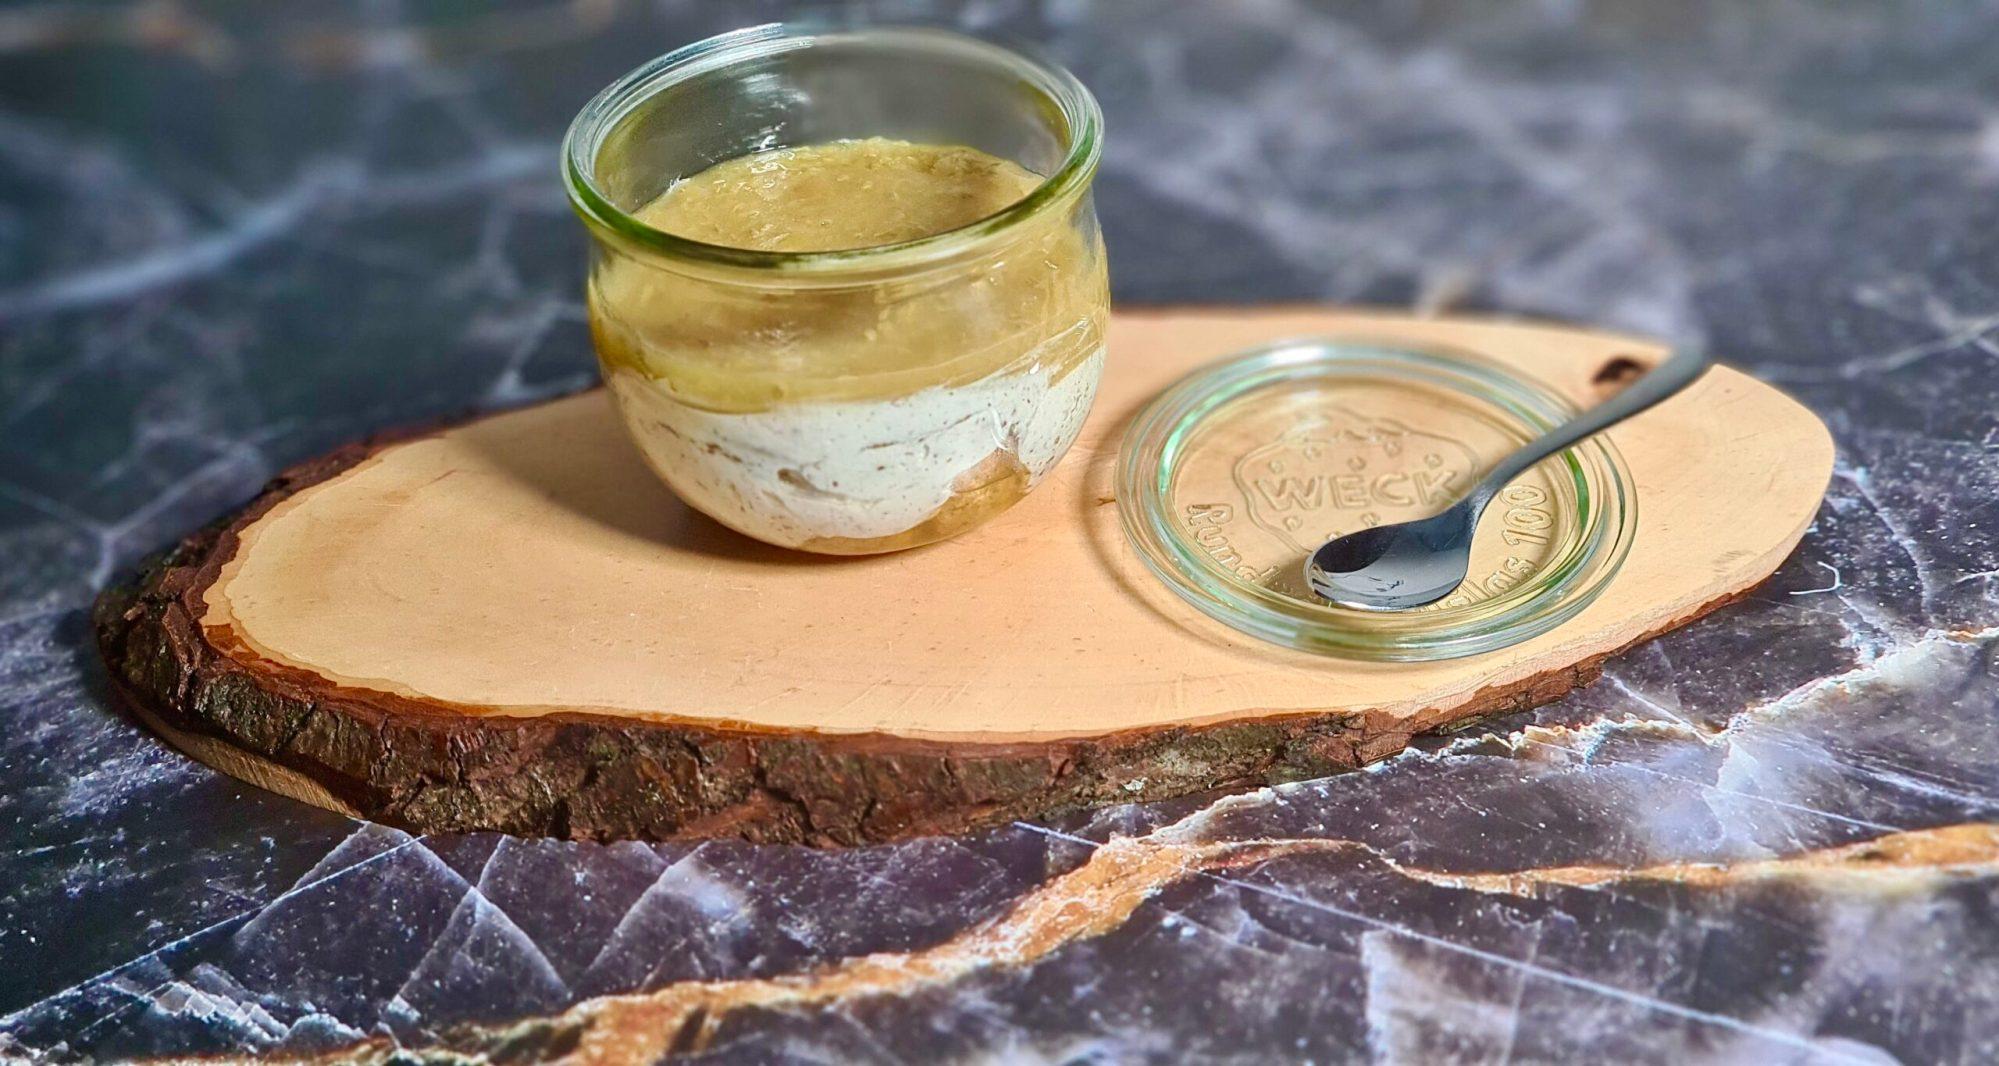 Stachelbeer Dessert scaled